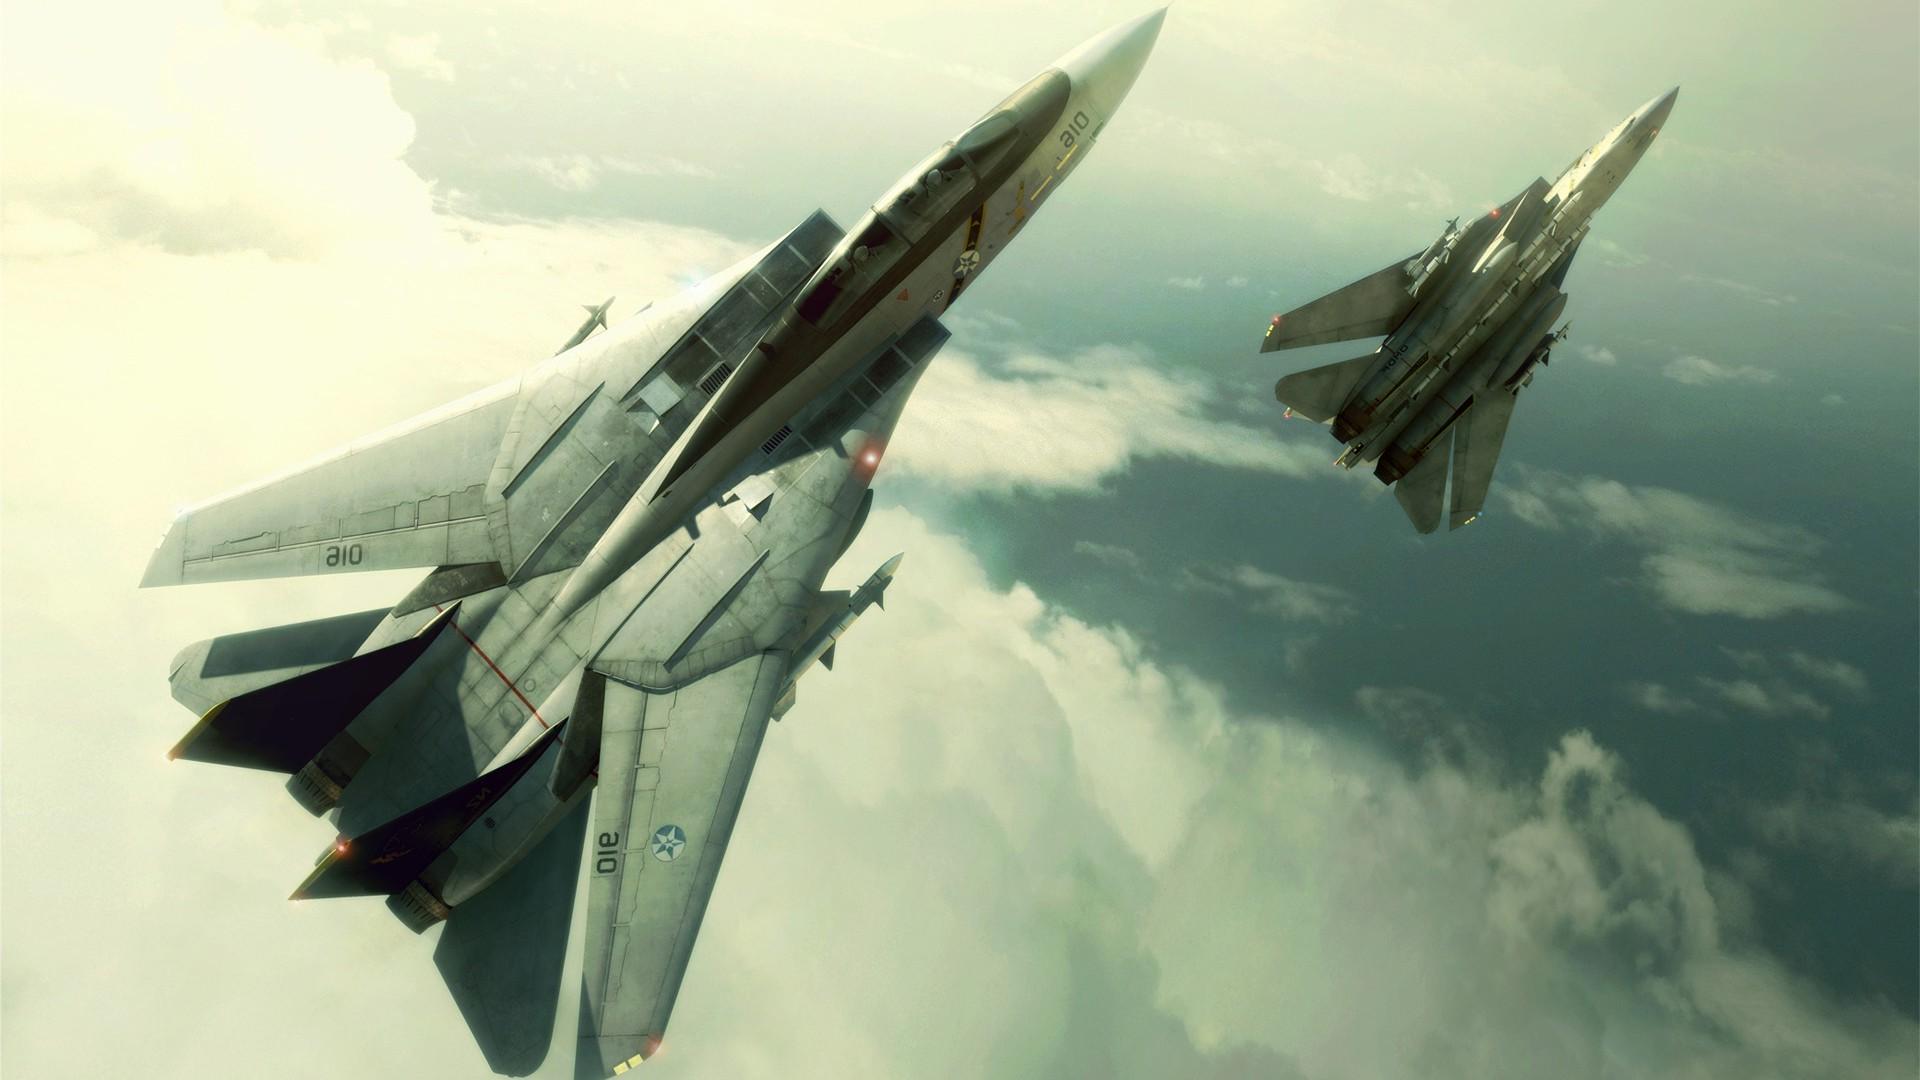 Res: 1920x1080, Grumman F-14 Tomcat Wallpapers 13 - 1920 X 1080